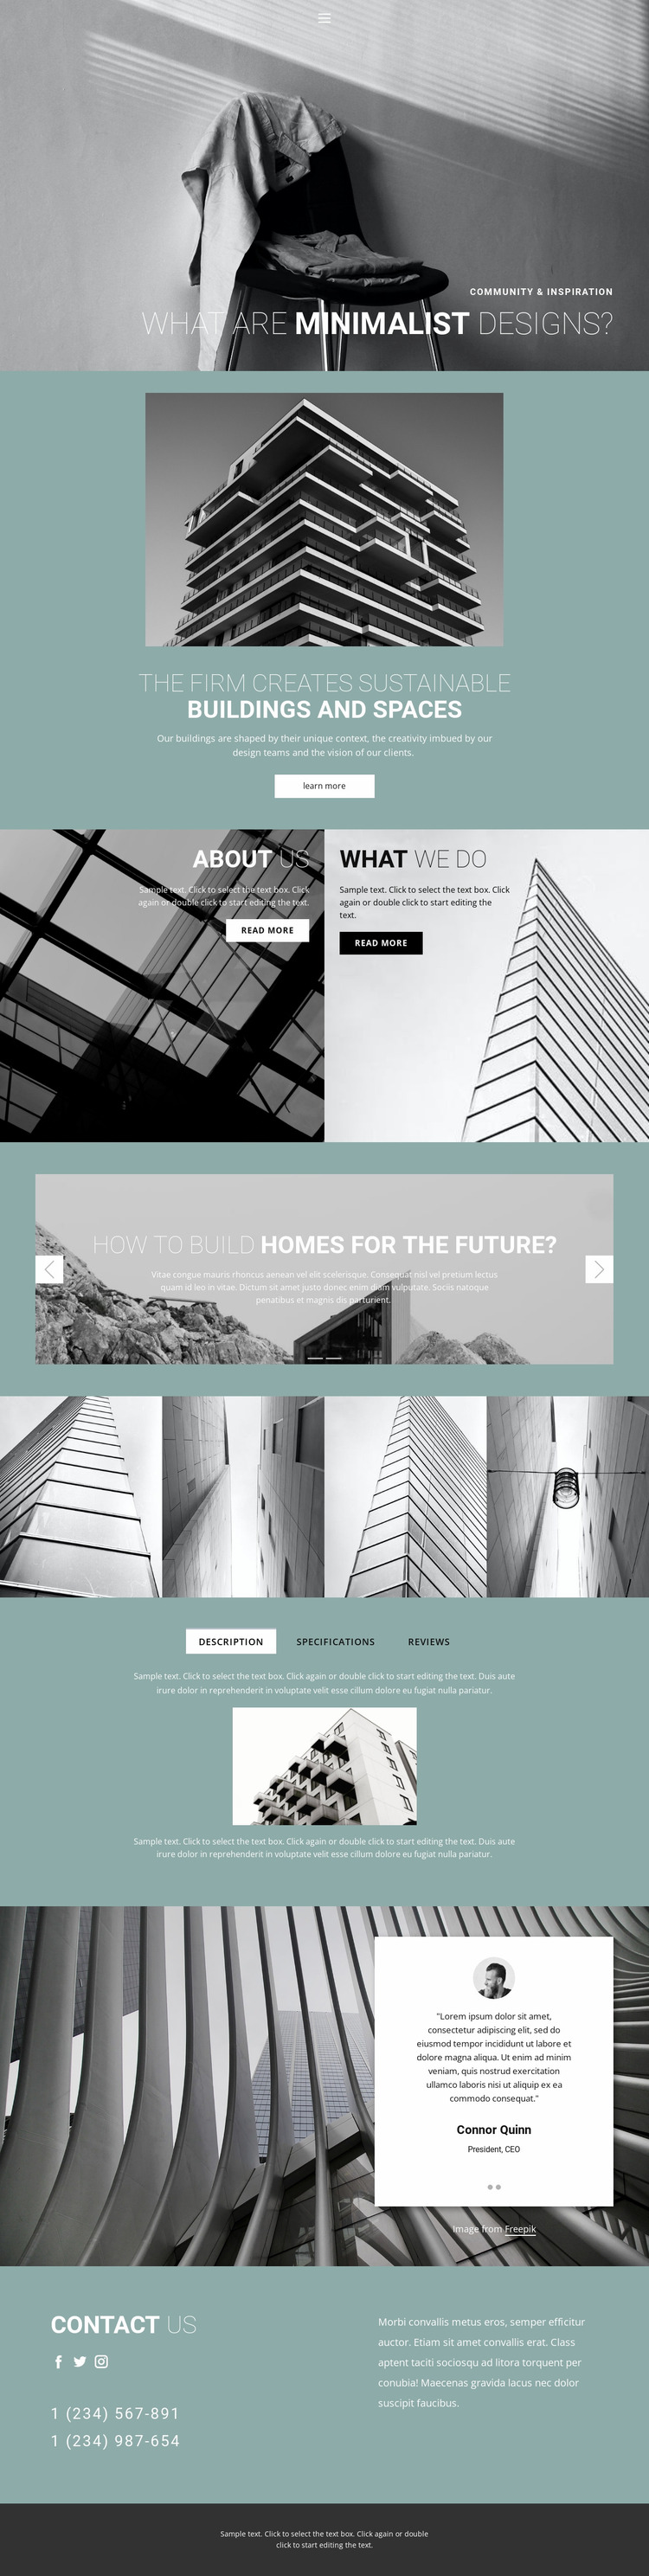 Perfect architecture ideas Website Mockup